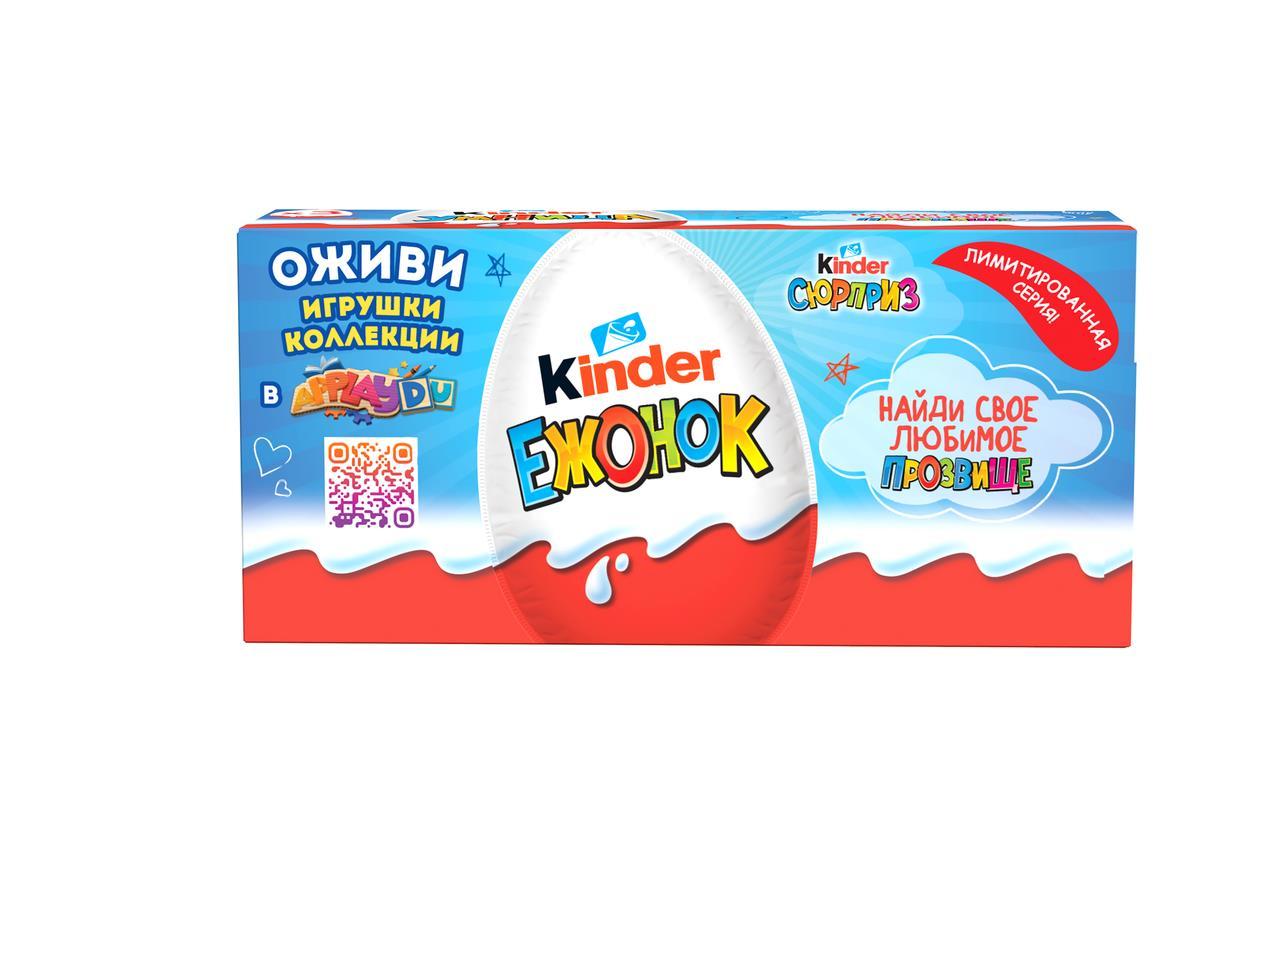 Шоколадные яйца KINDER Сюрприз, 3х20г